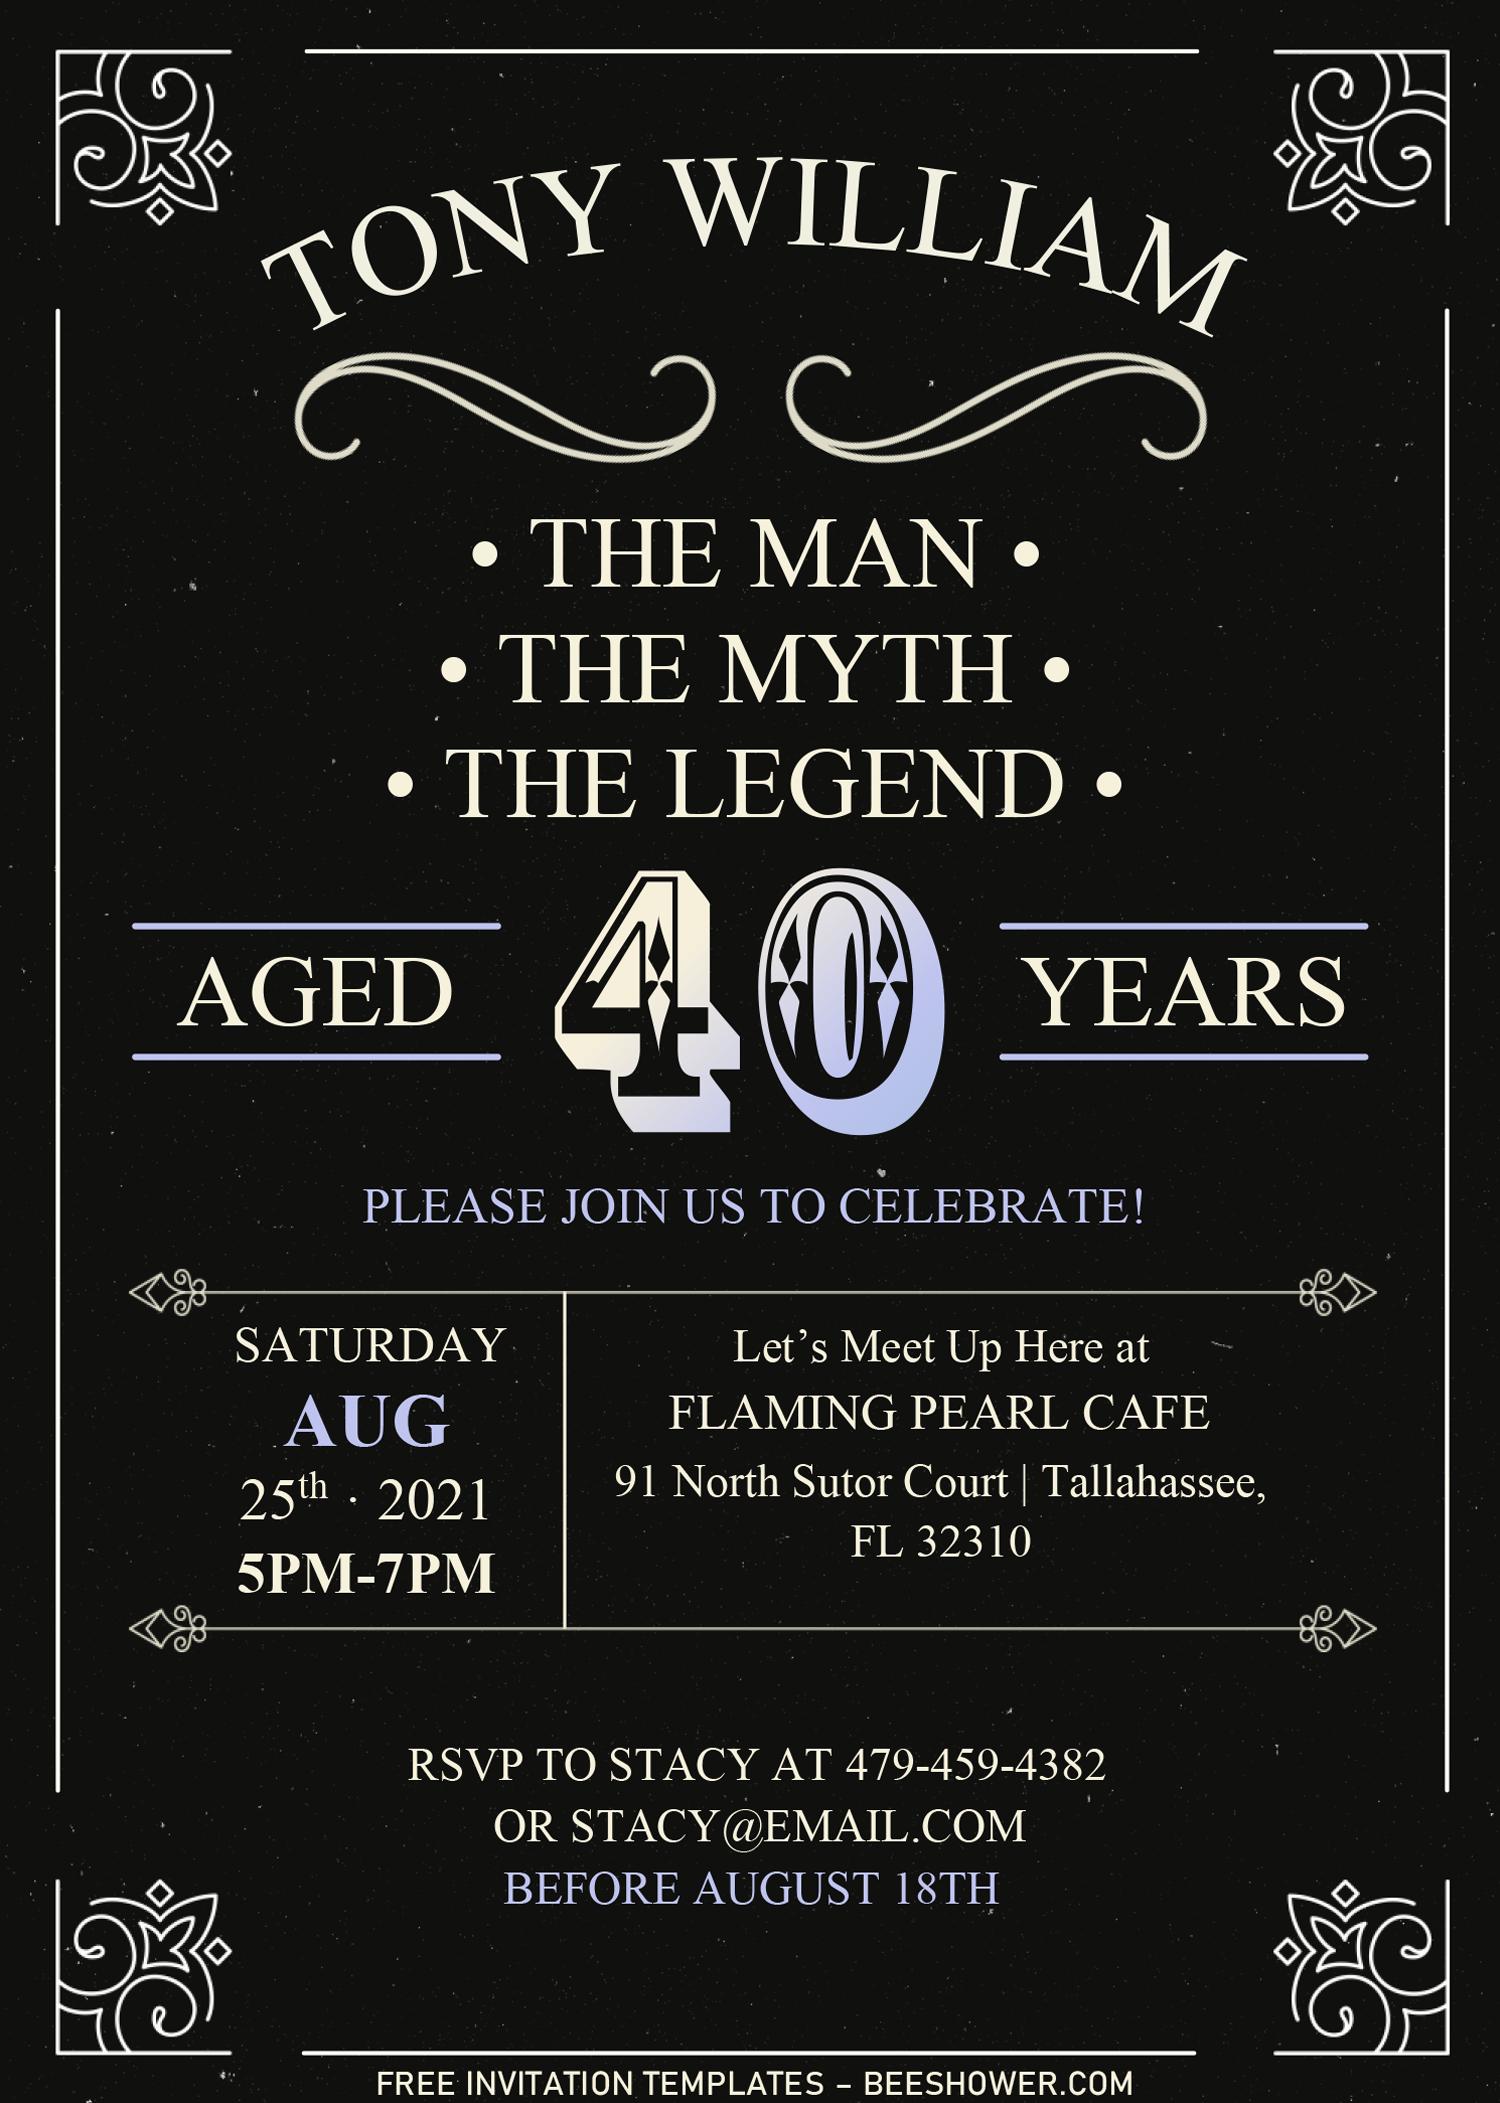 Vintage Dude Invitation Templates Editable With Microsoft Word In 2020 Invitation Template Printable Birthday Invitations Free Printable Birthday Invitations